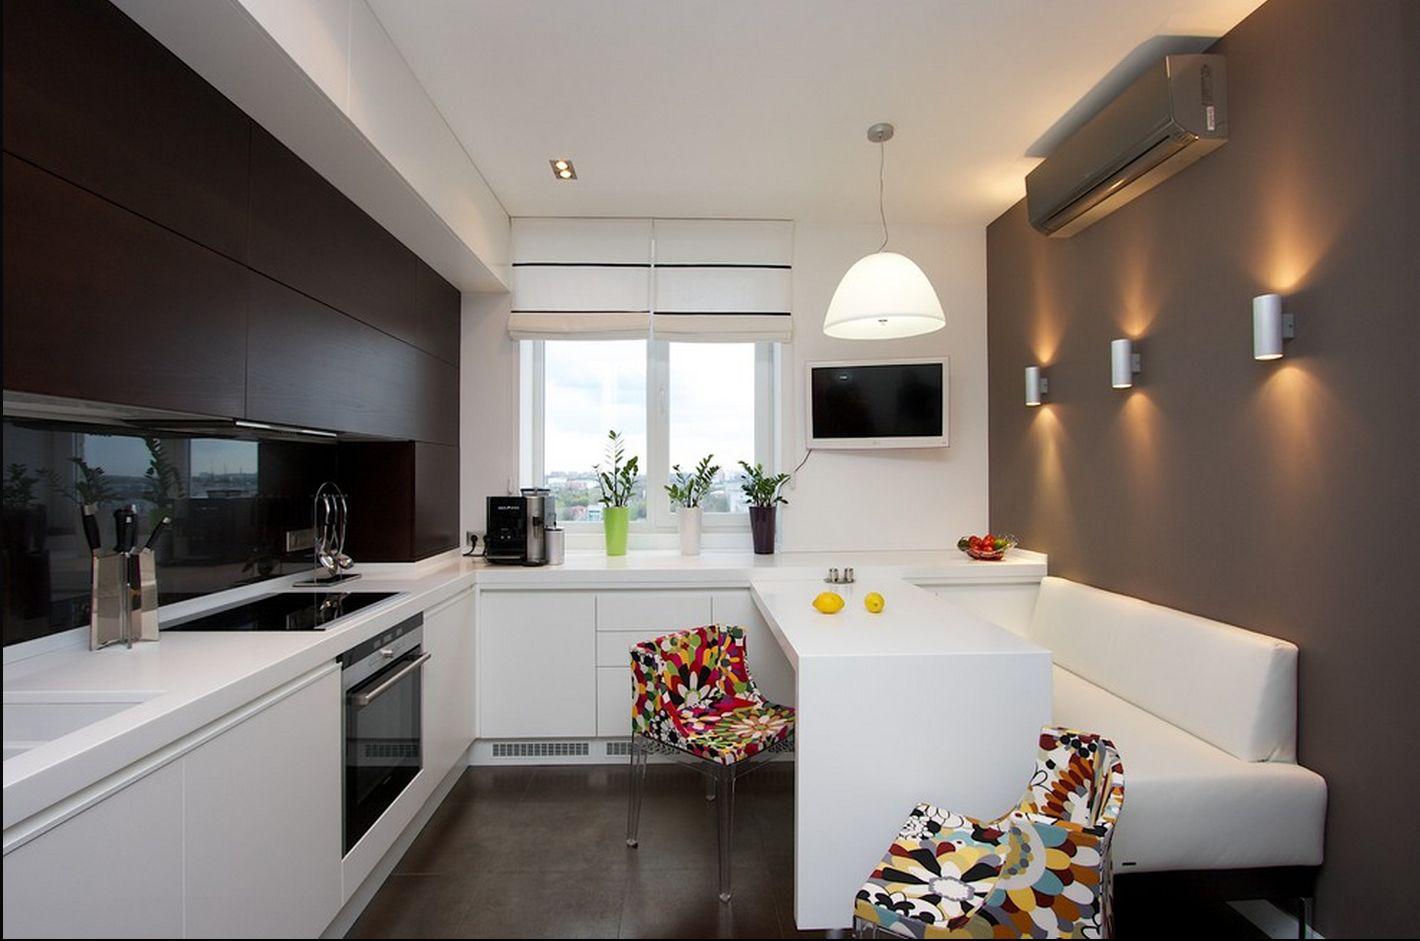 кухня 12 метров в стиле минимализм